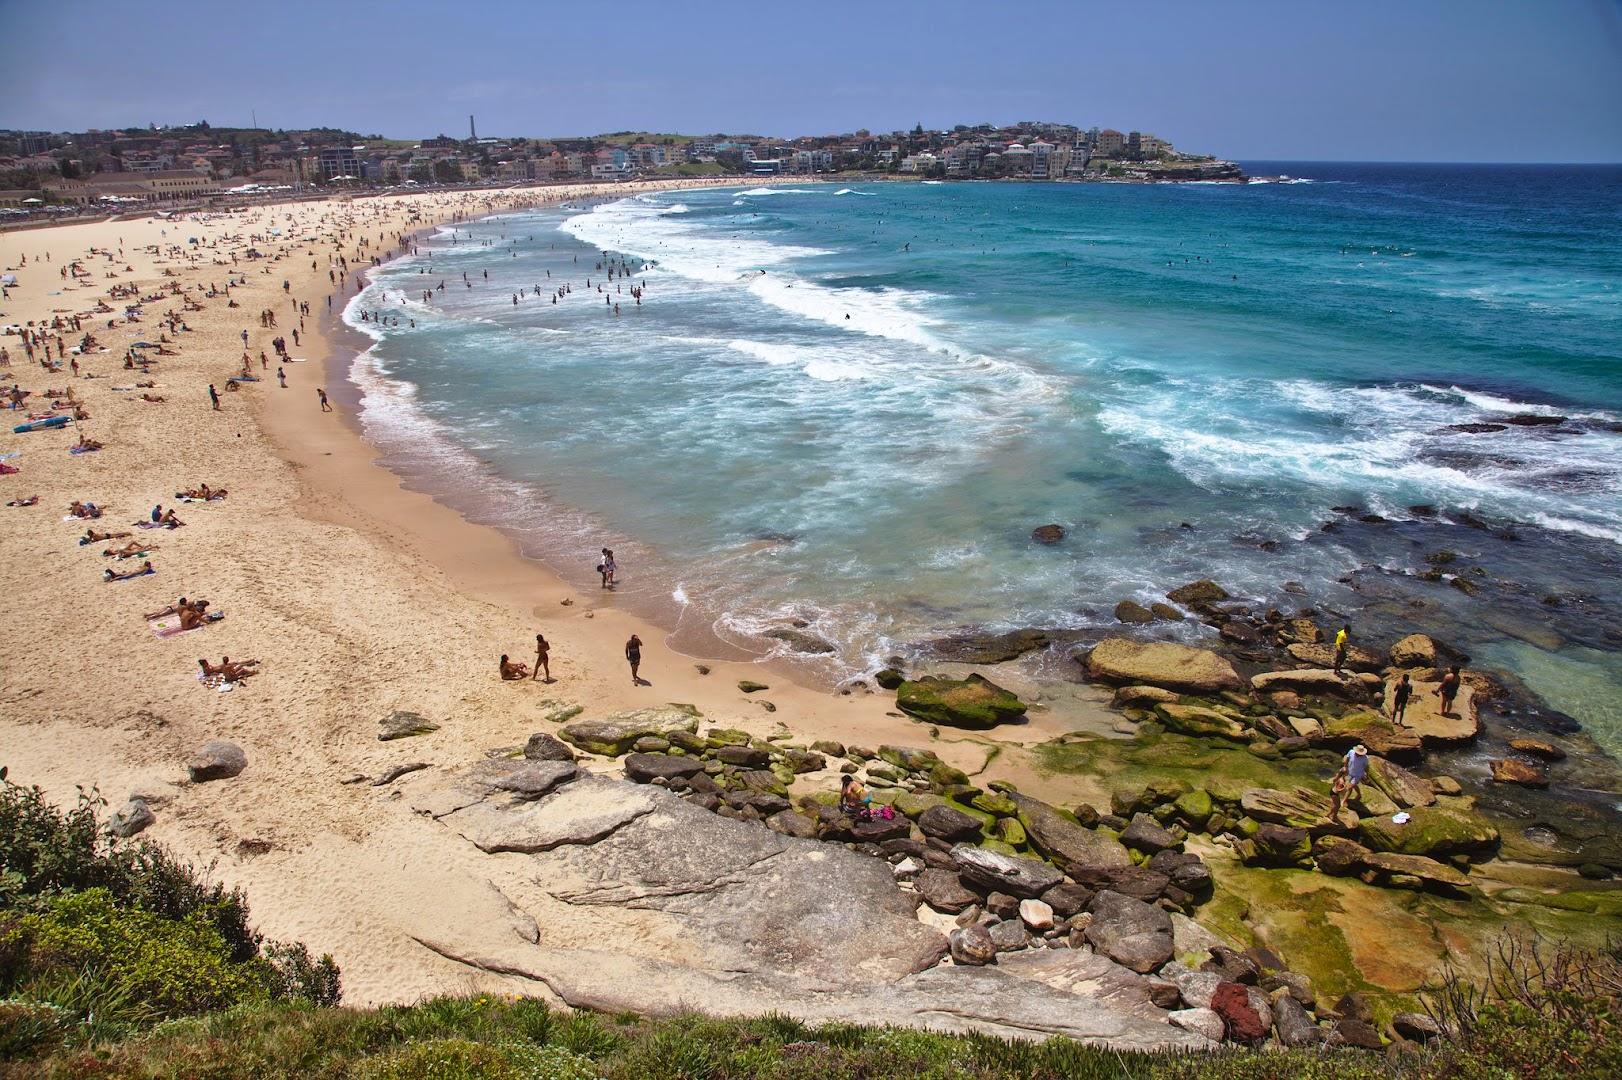 The famous Bondi beach